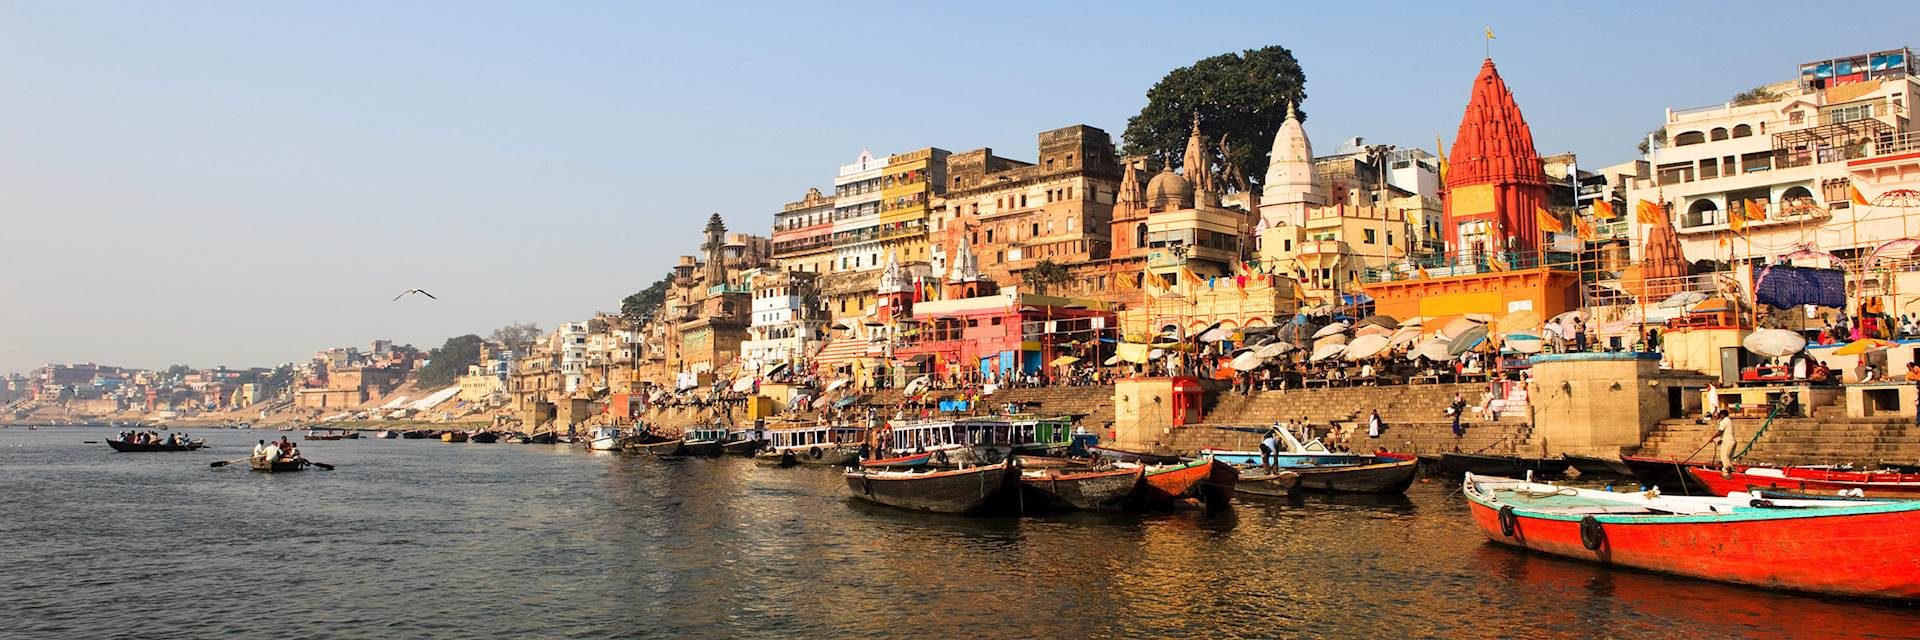 Riverside ghats, Varanasi, India